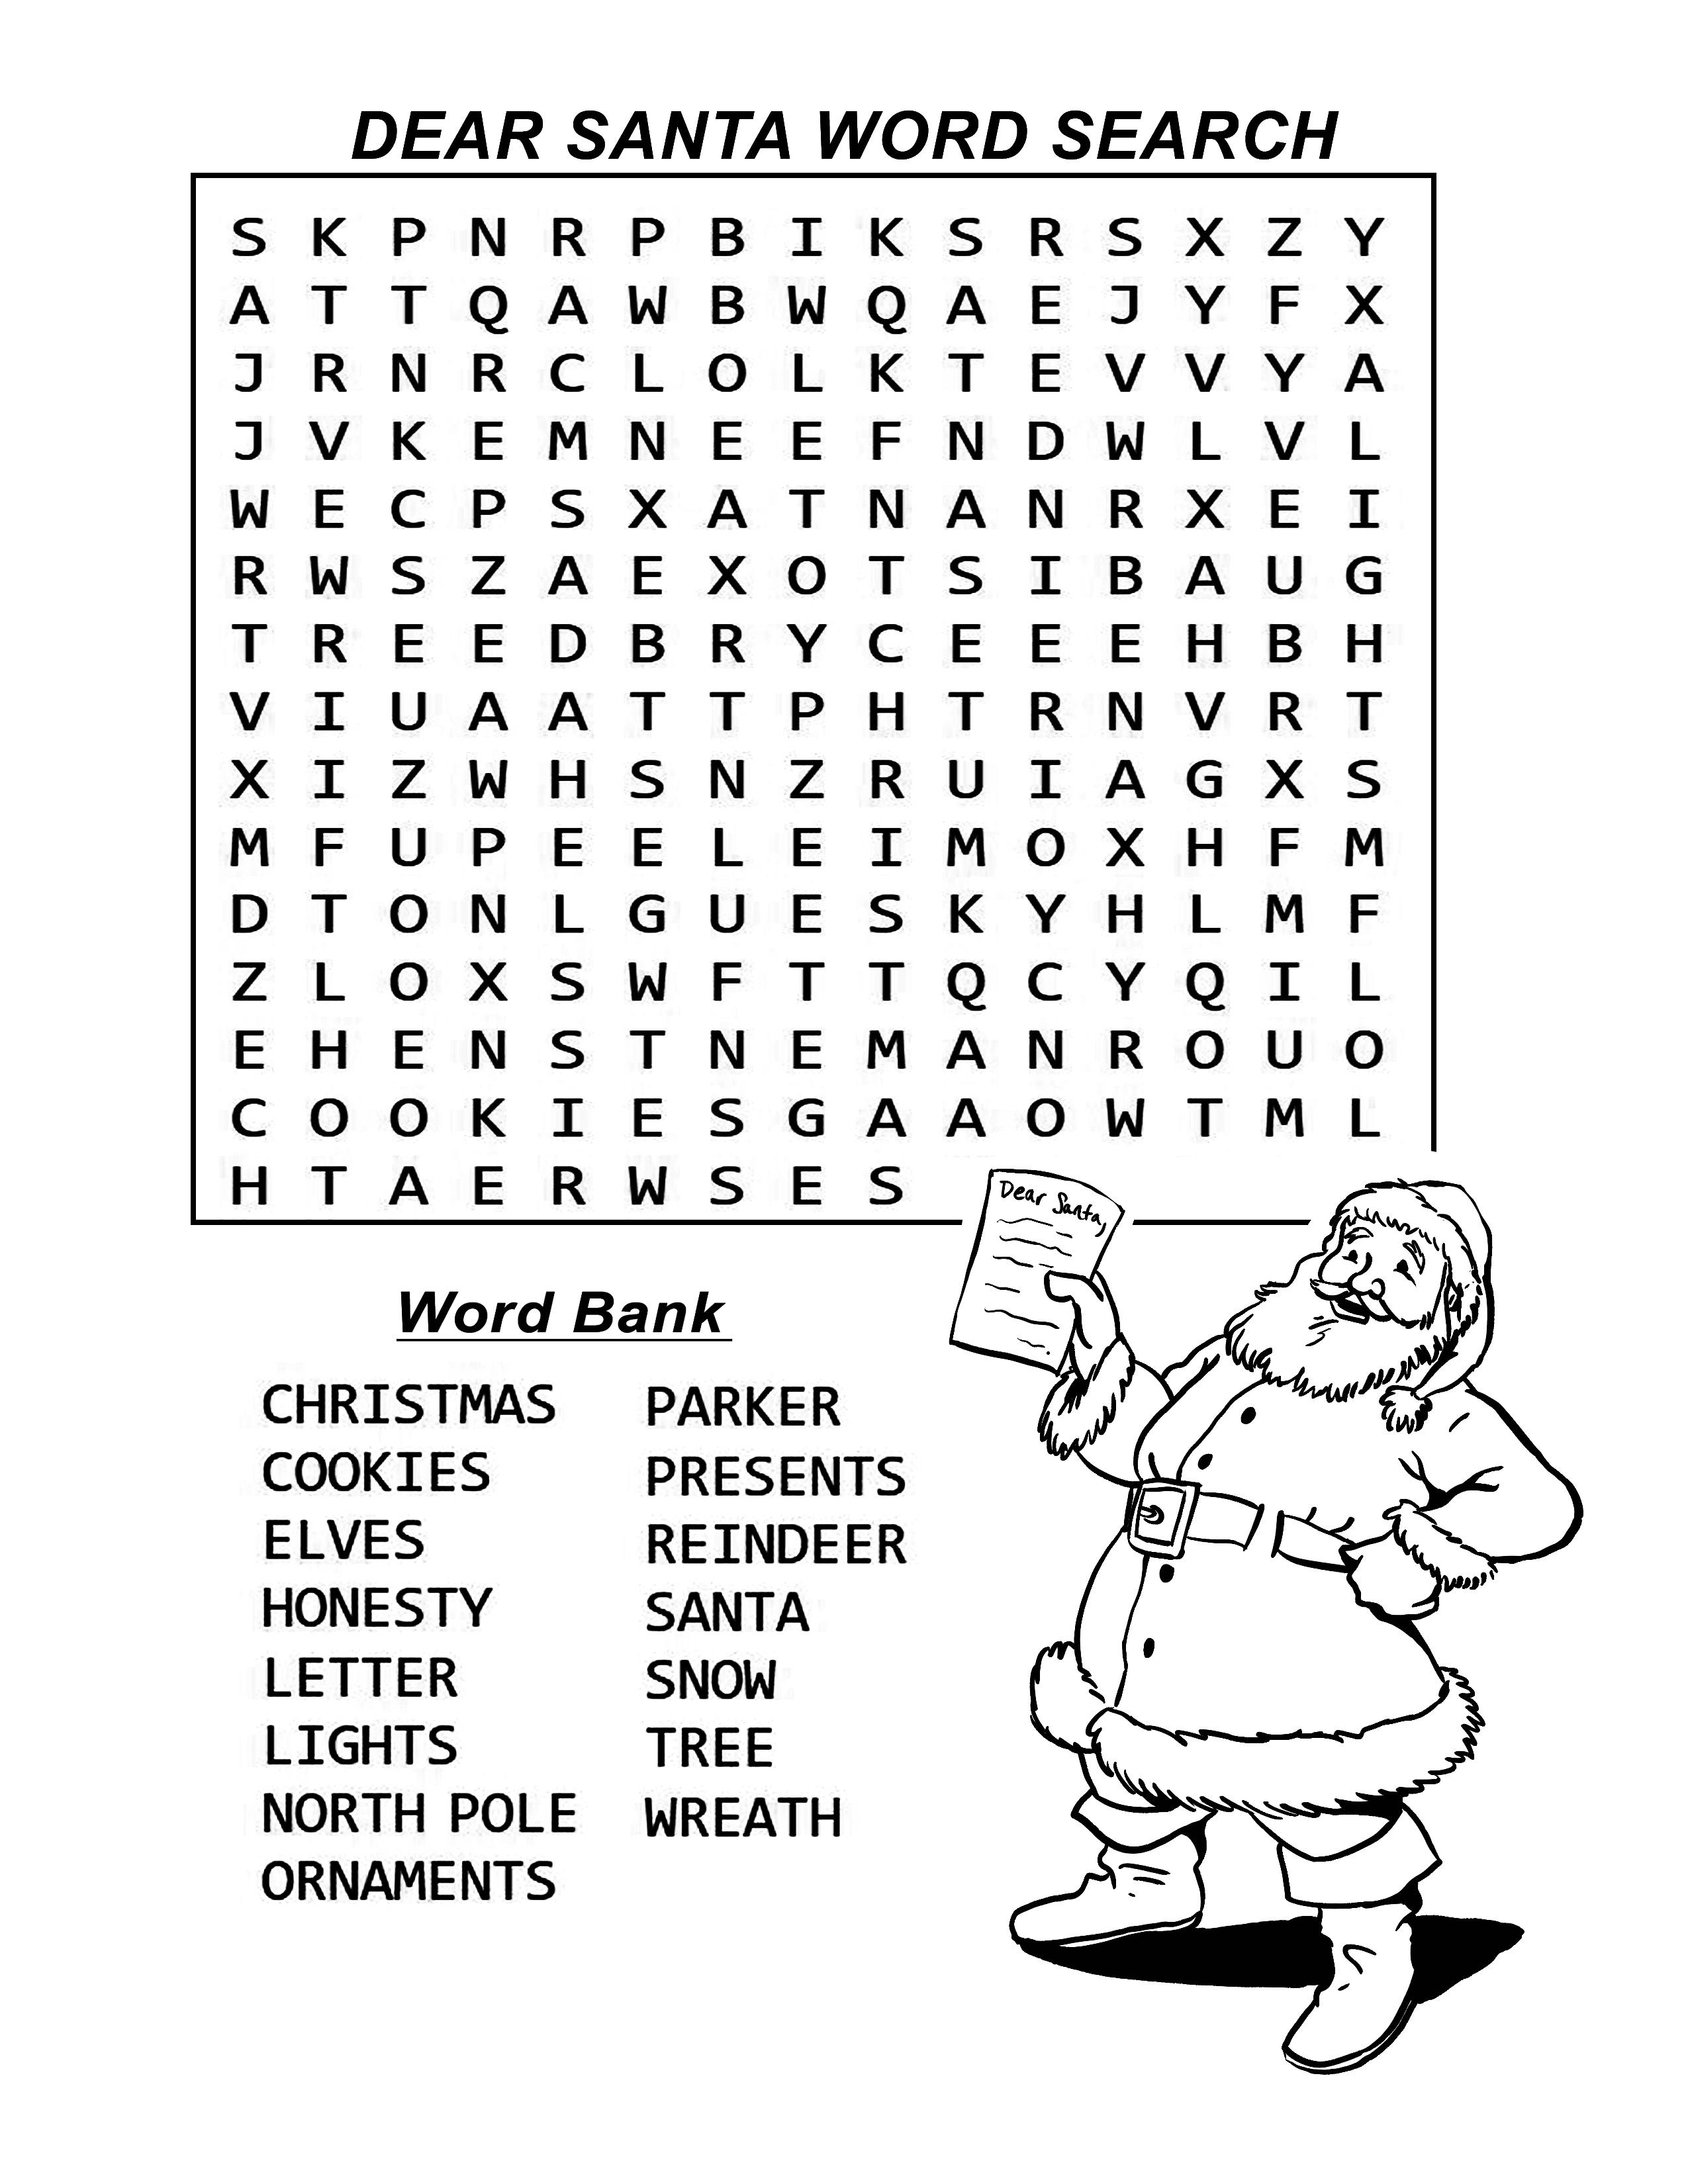 word search dear santa